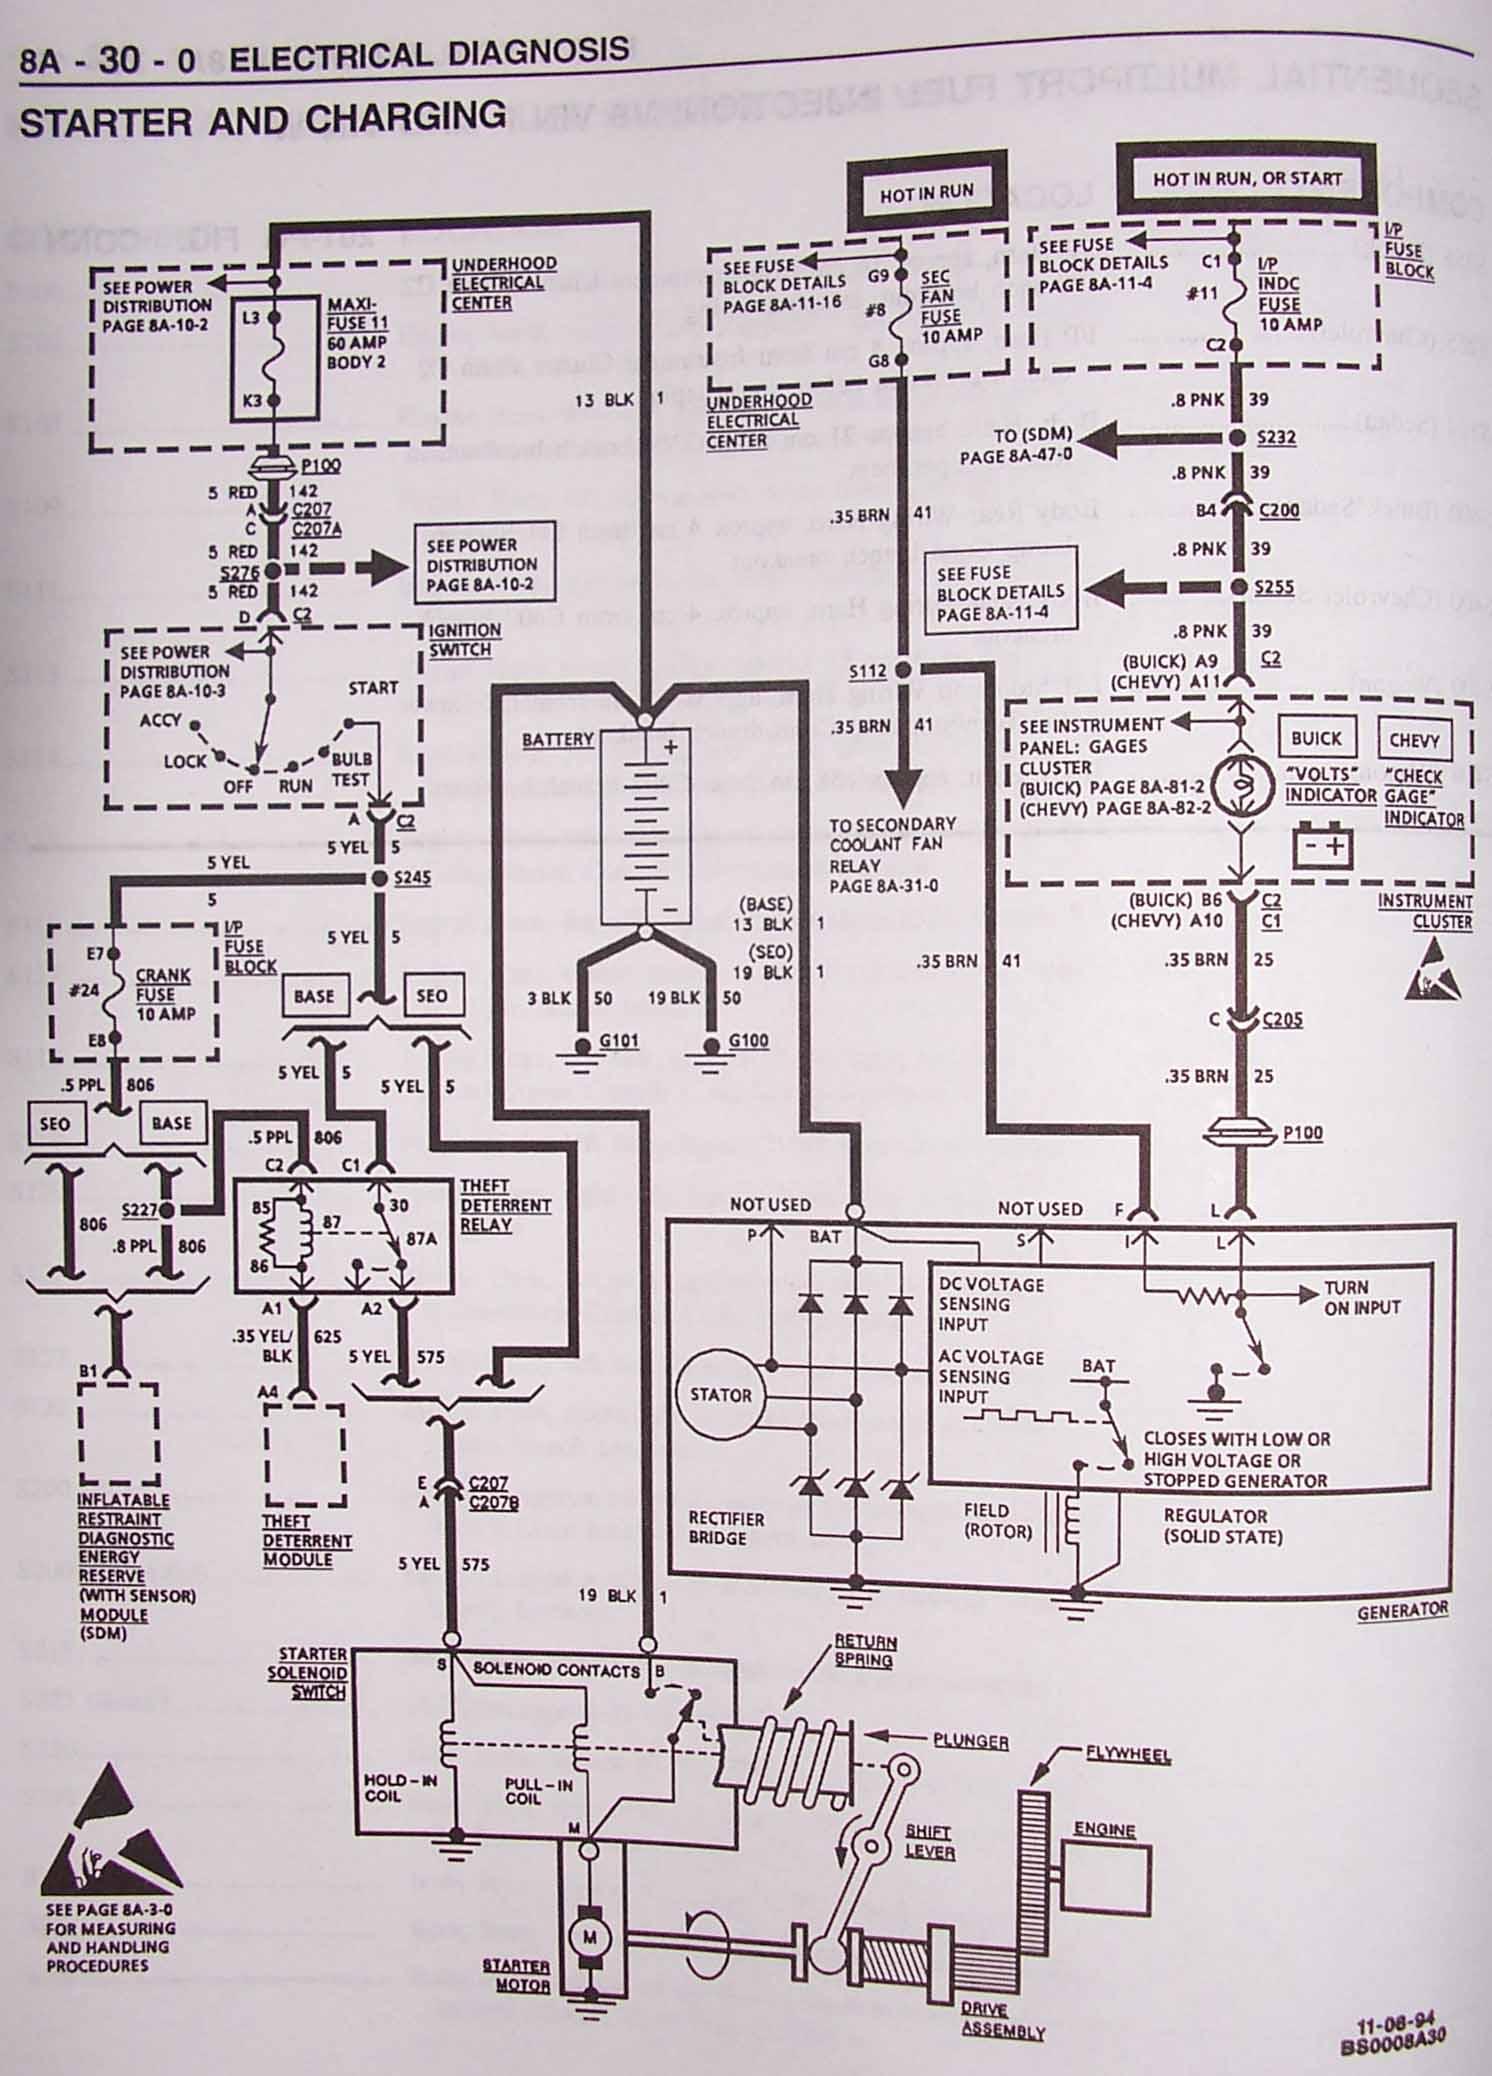 1995 impala ss fuel pump wiring diagram